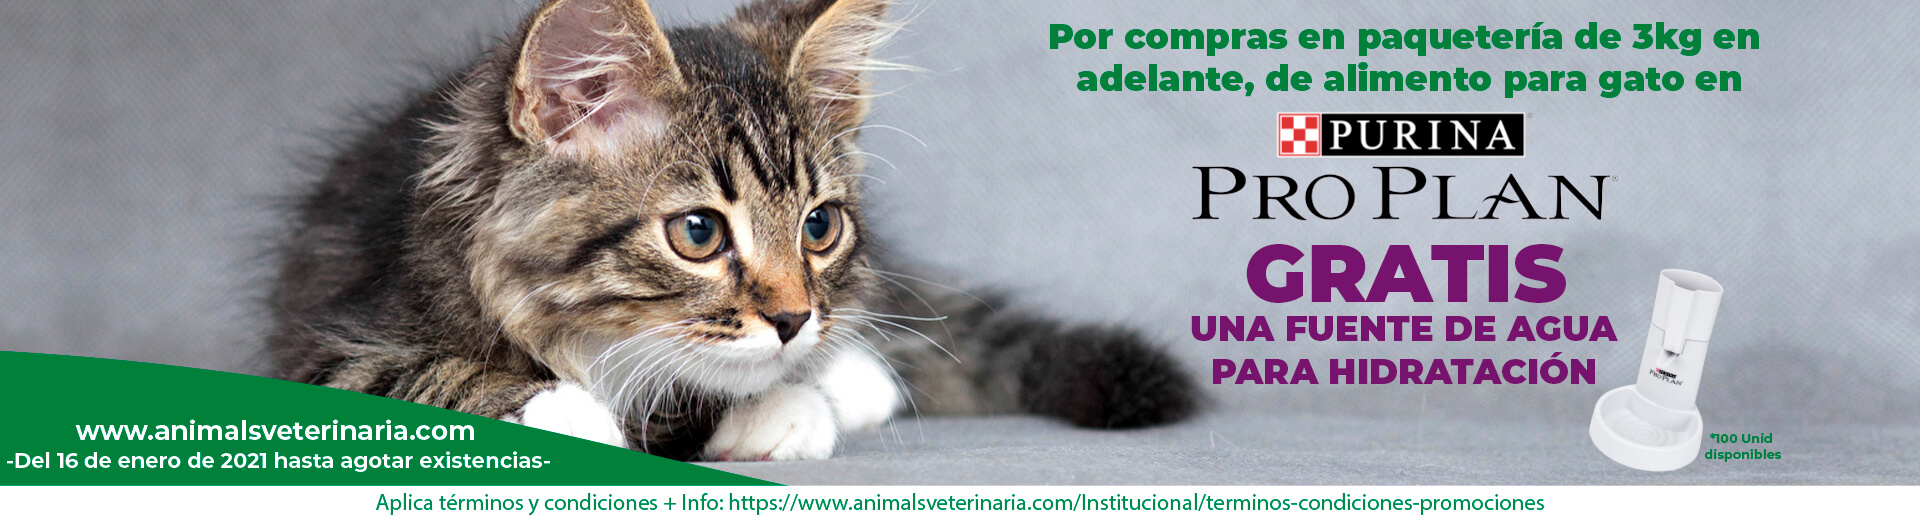 Alimento para gatos PURINA - Promo fuente